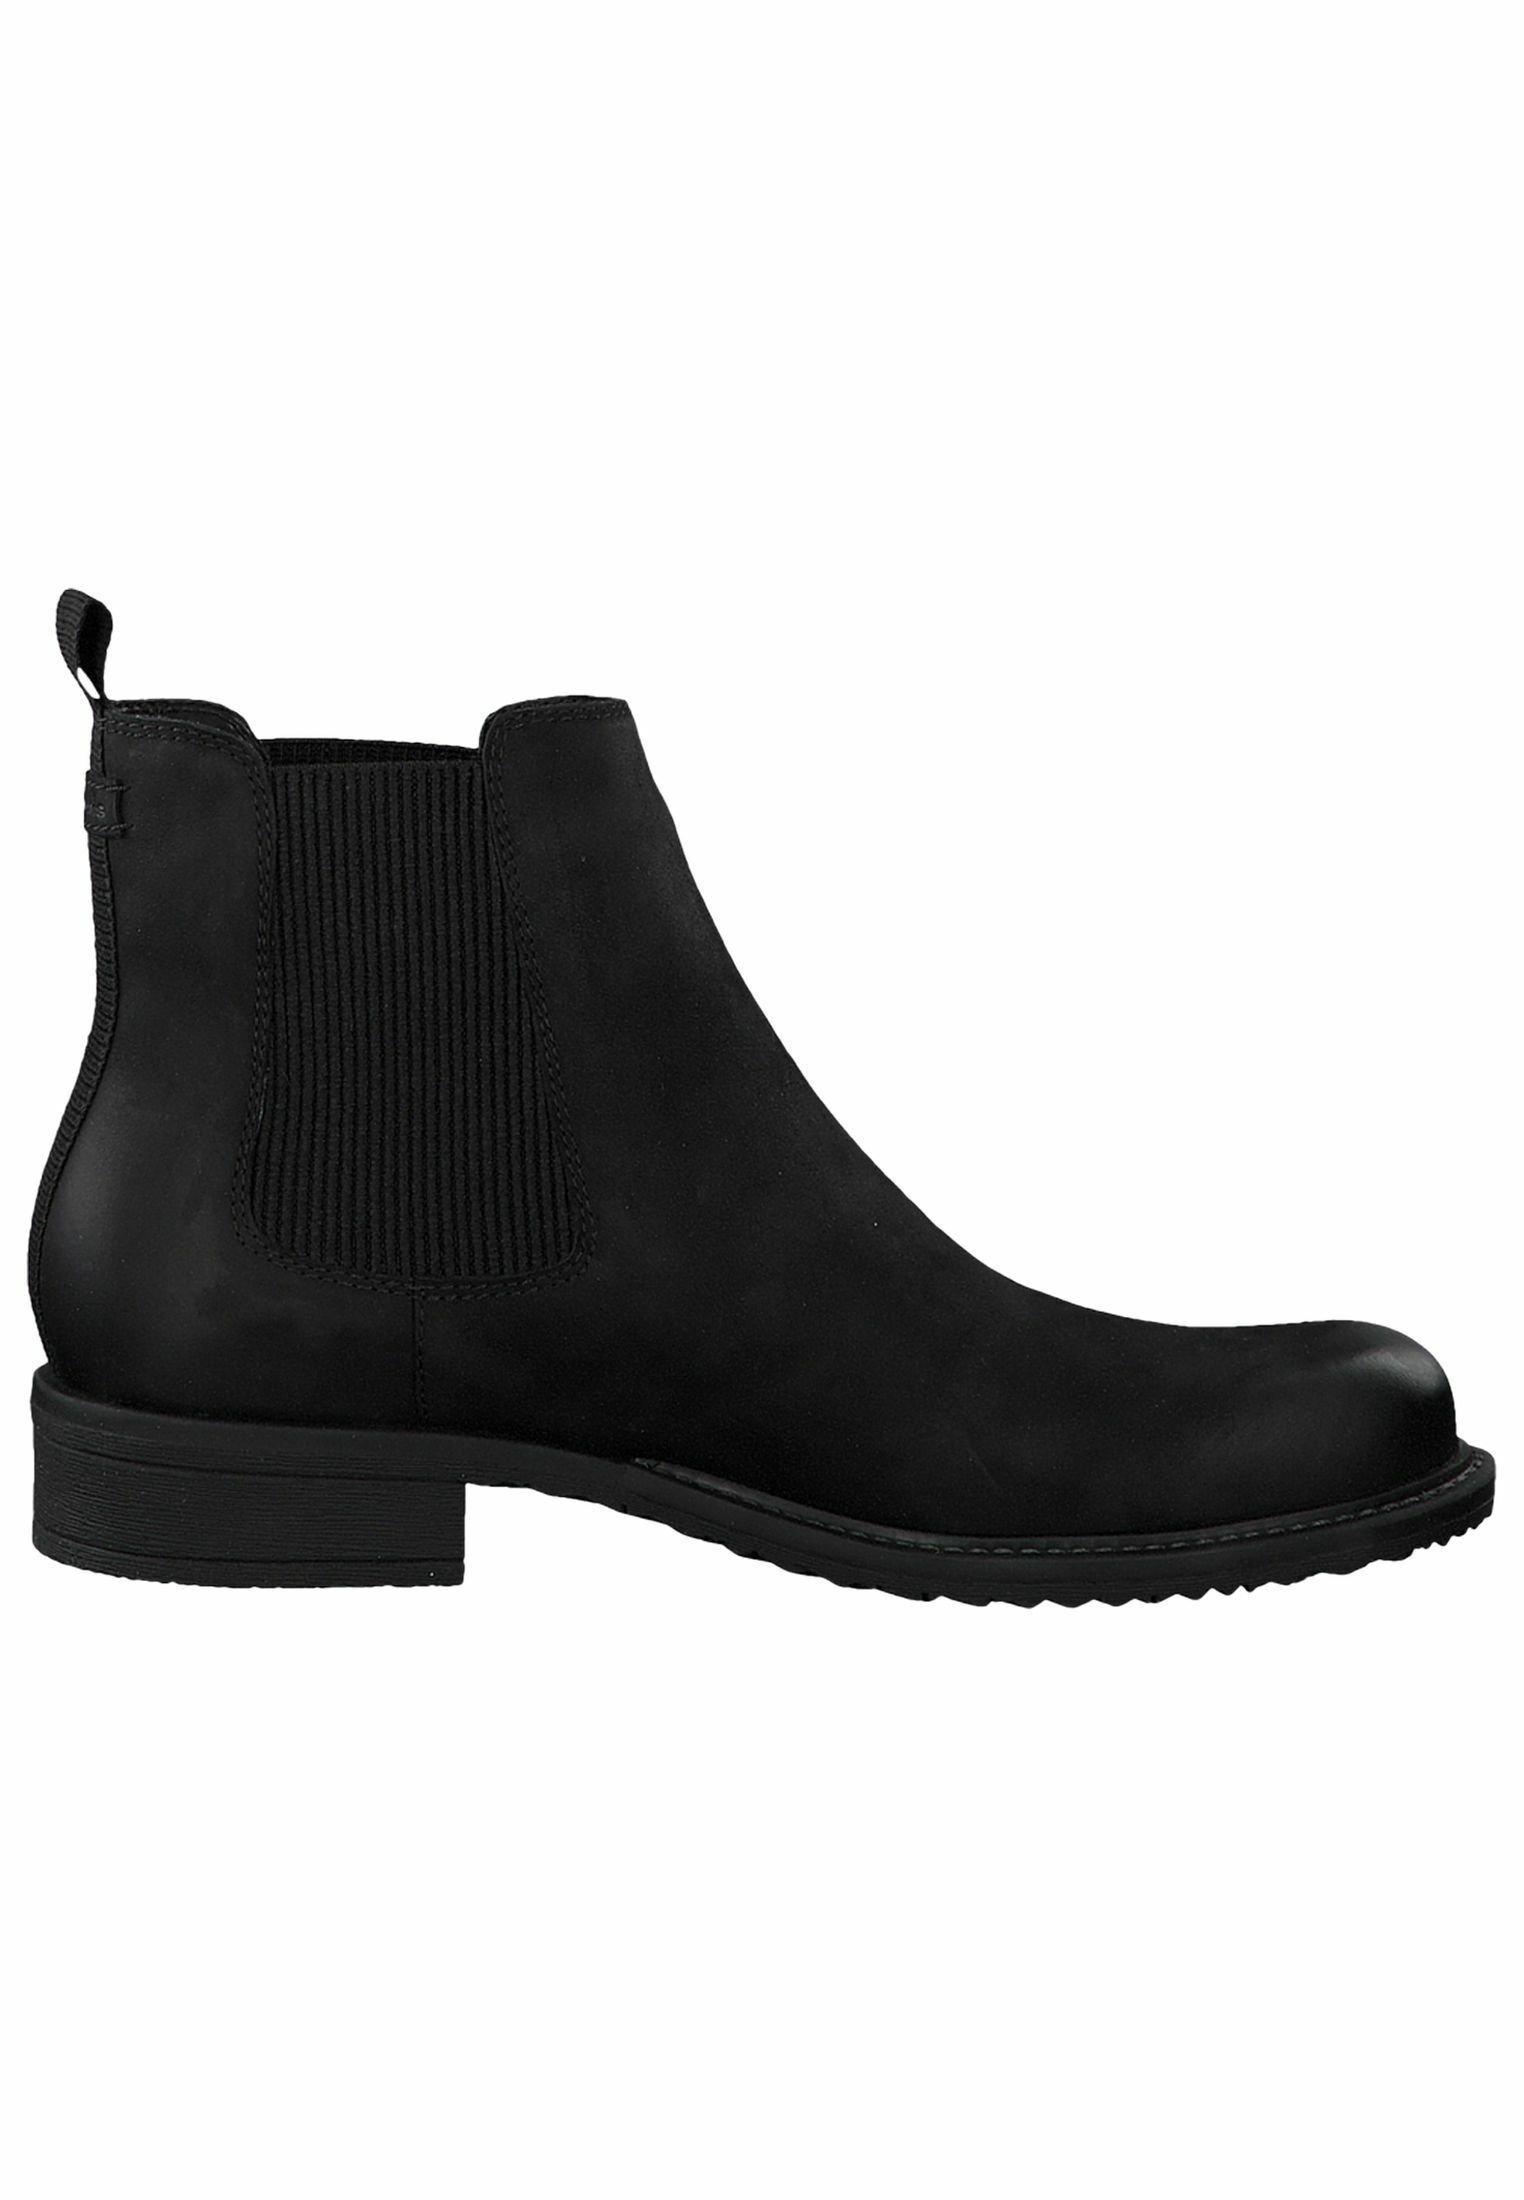 Tamaris CHELSEA  Ankle Boot black/schwarz